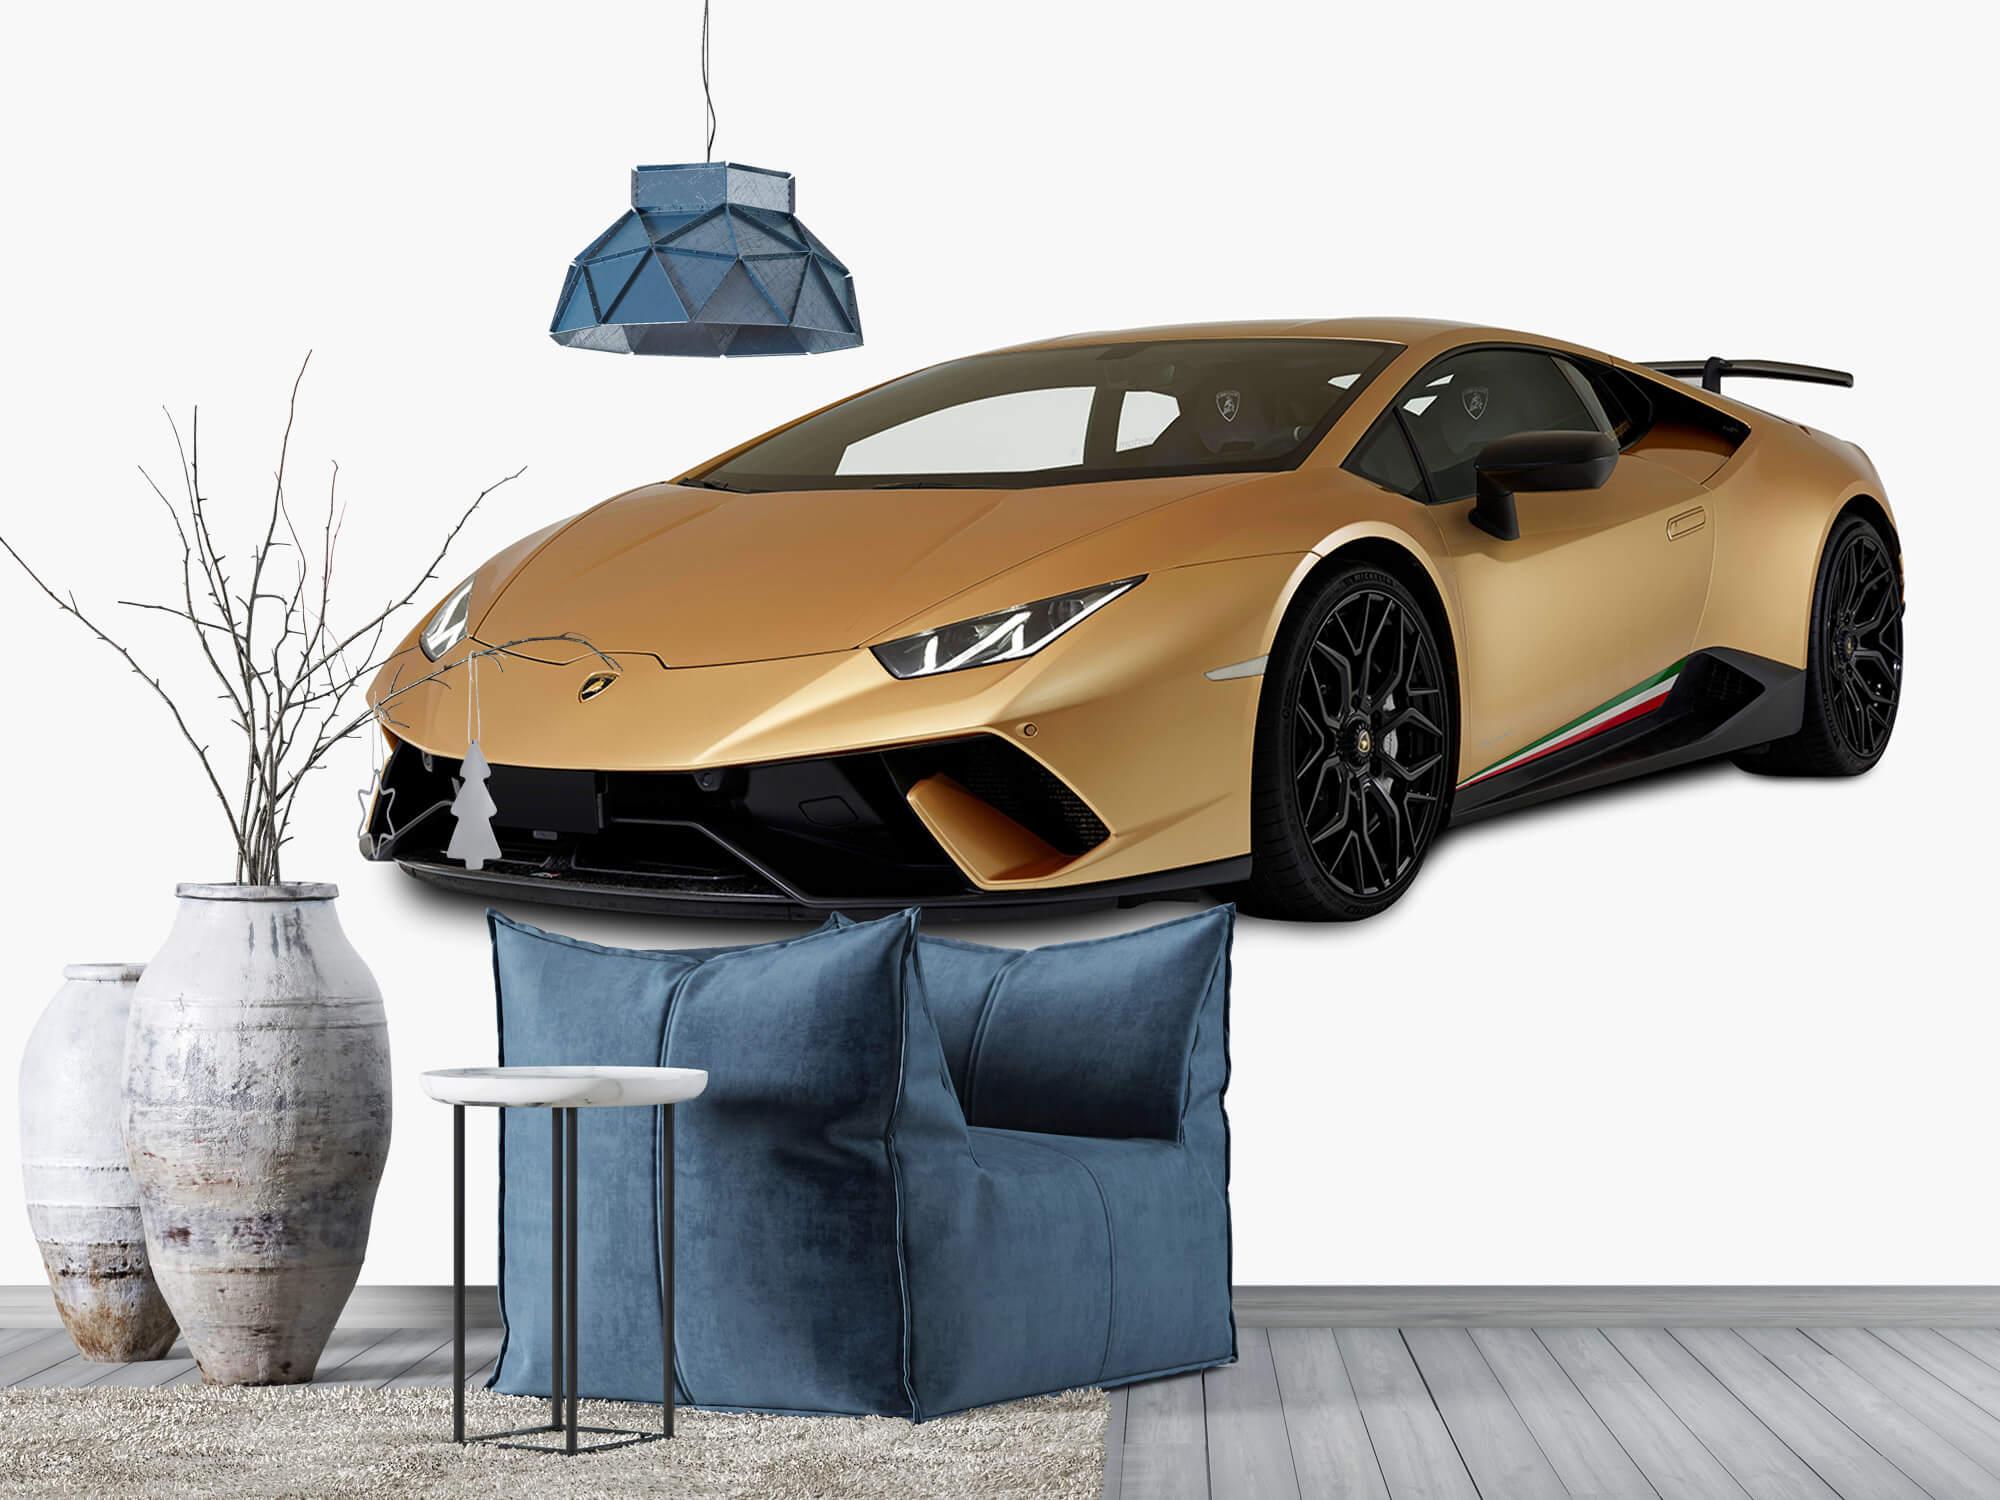 Wallpaper Lamborghini Huracán - Avant droit, blanc 6